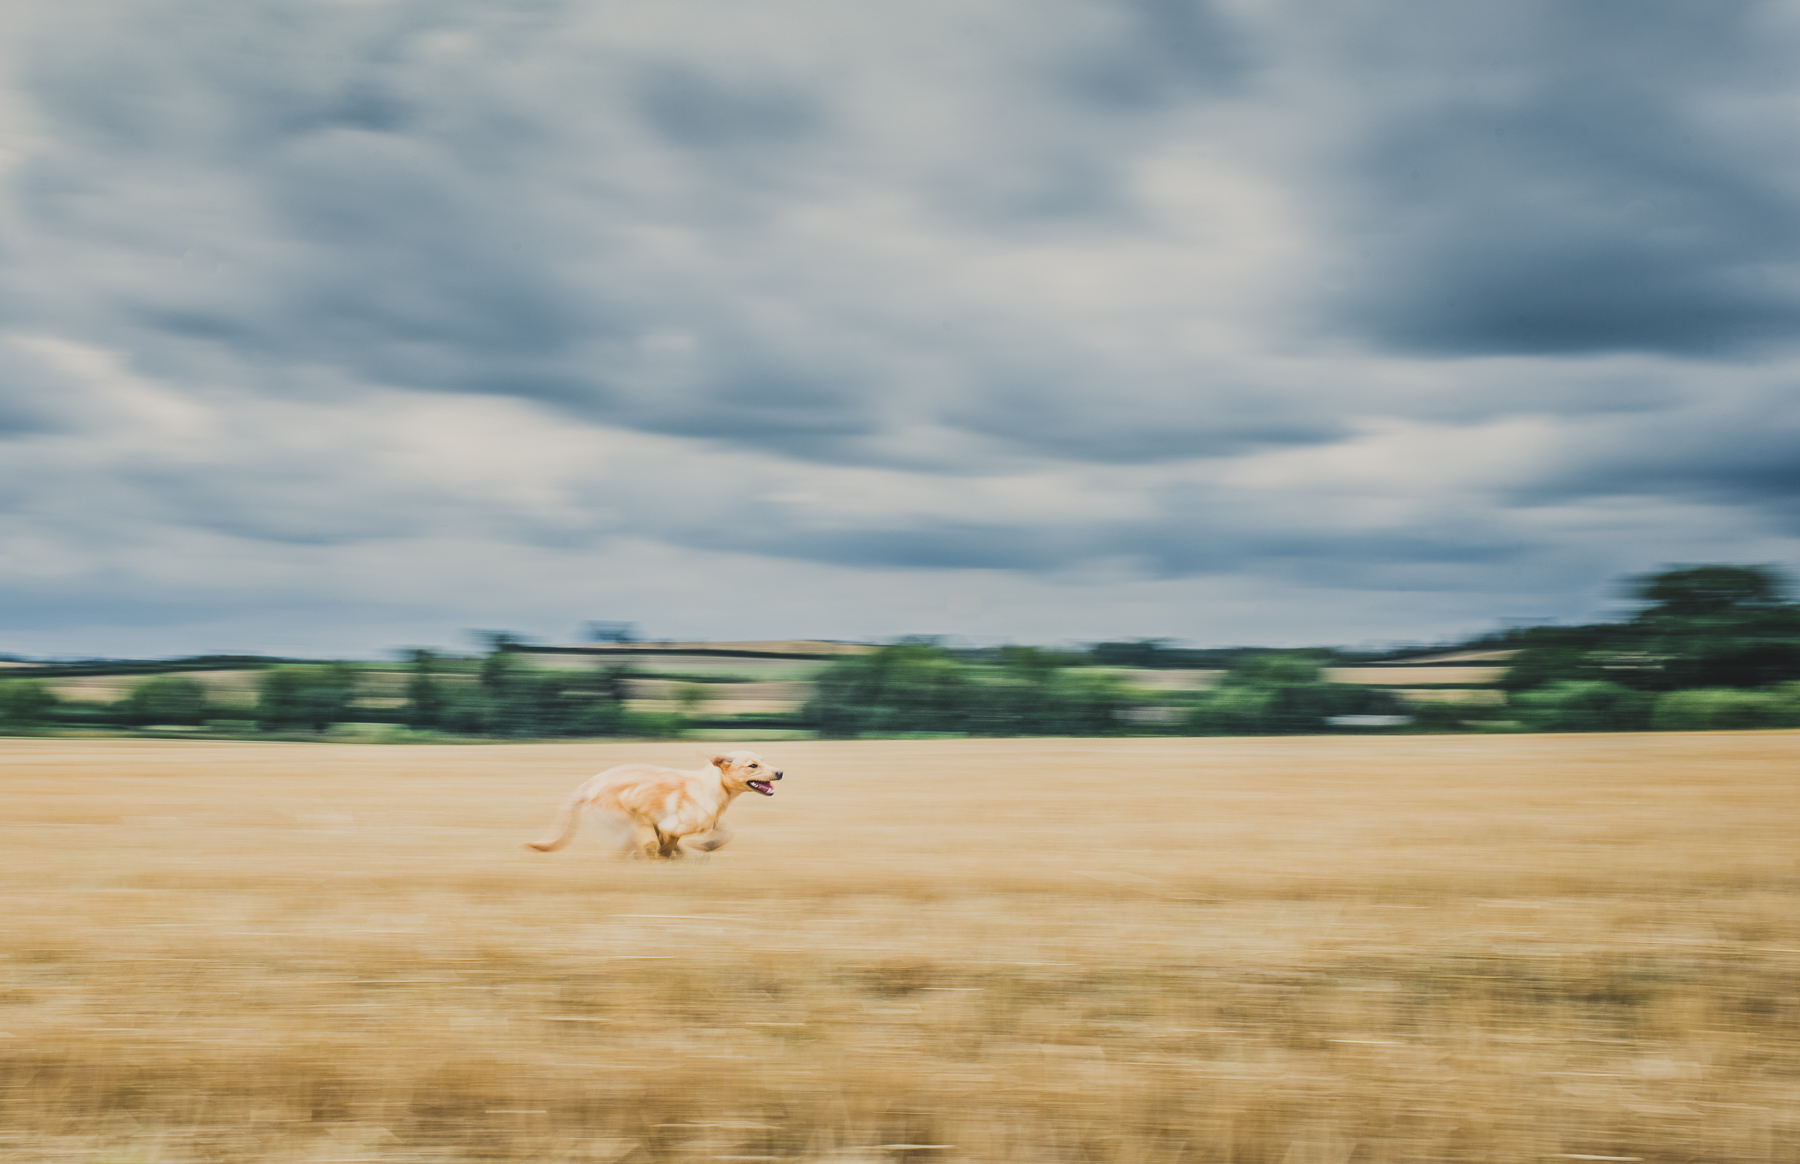 Dog running through old wheat feild